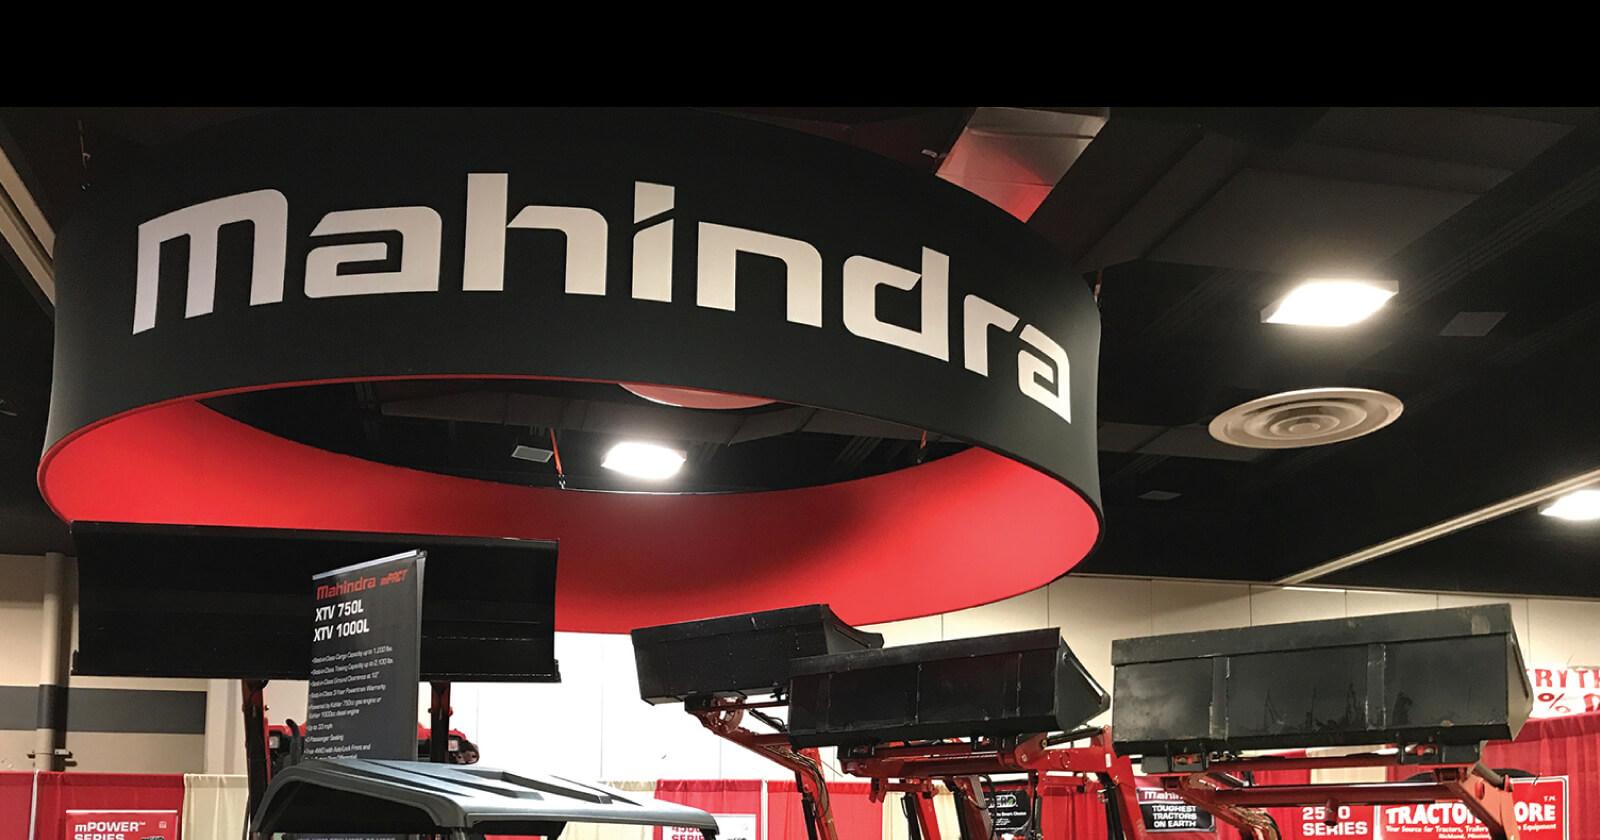 Mahindra-slider-bright.jpg